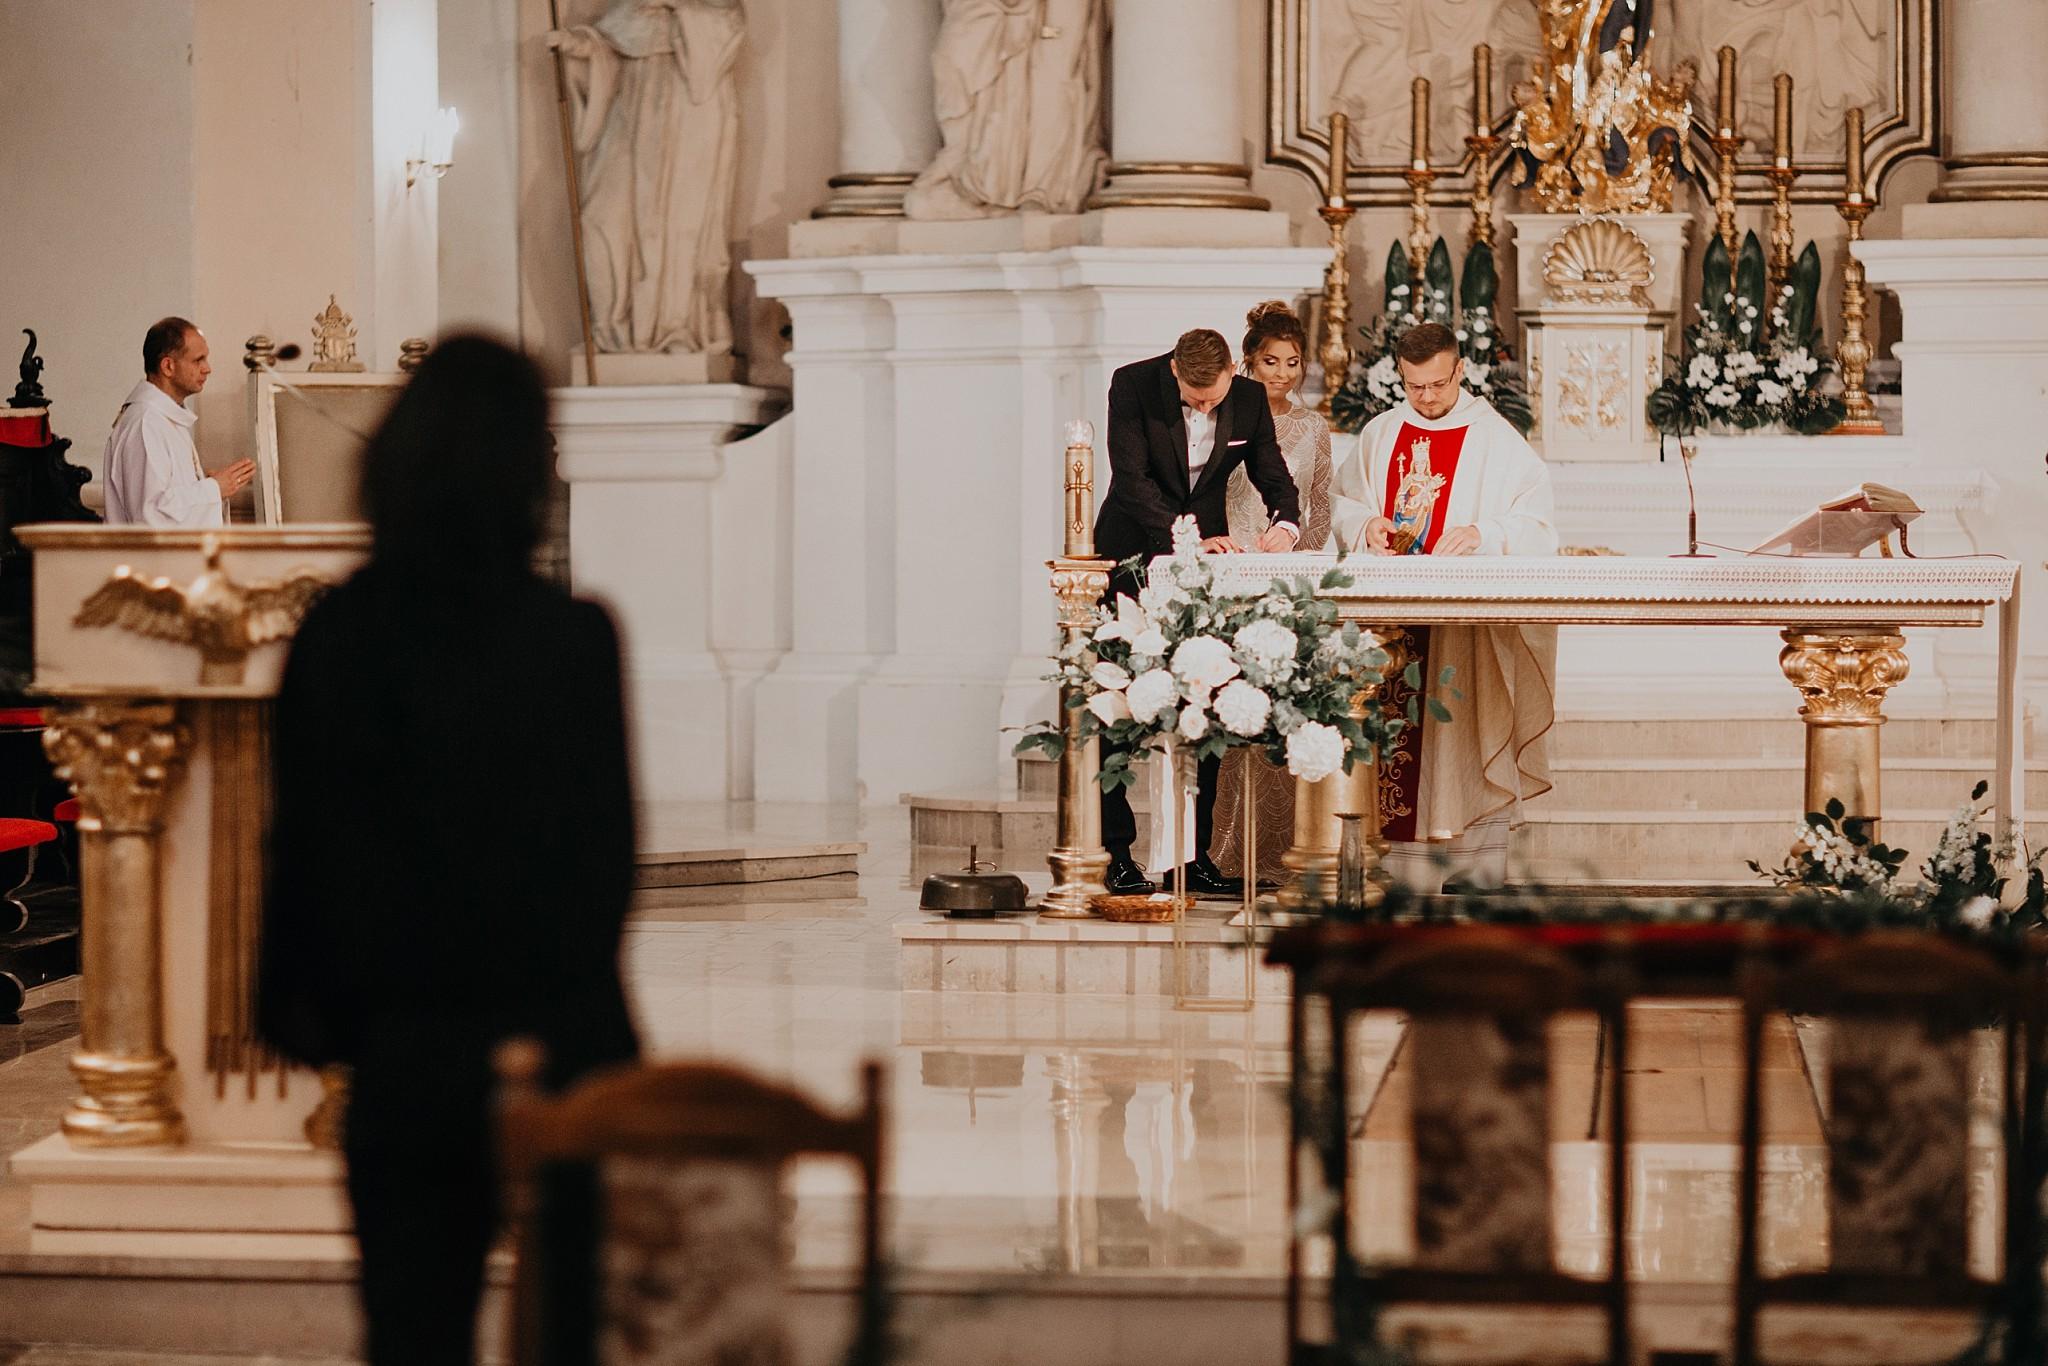 fotograf poznan wesele dobra truskawka piekne wesele pod poznaniem wesele w dobrej truskawce piekna para mloda slub marzen slub koronawirus slub listopad wesele koronawirus 199